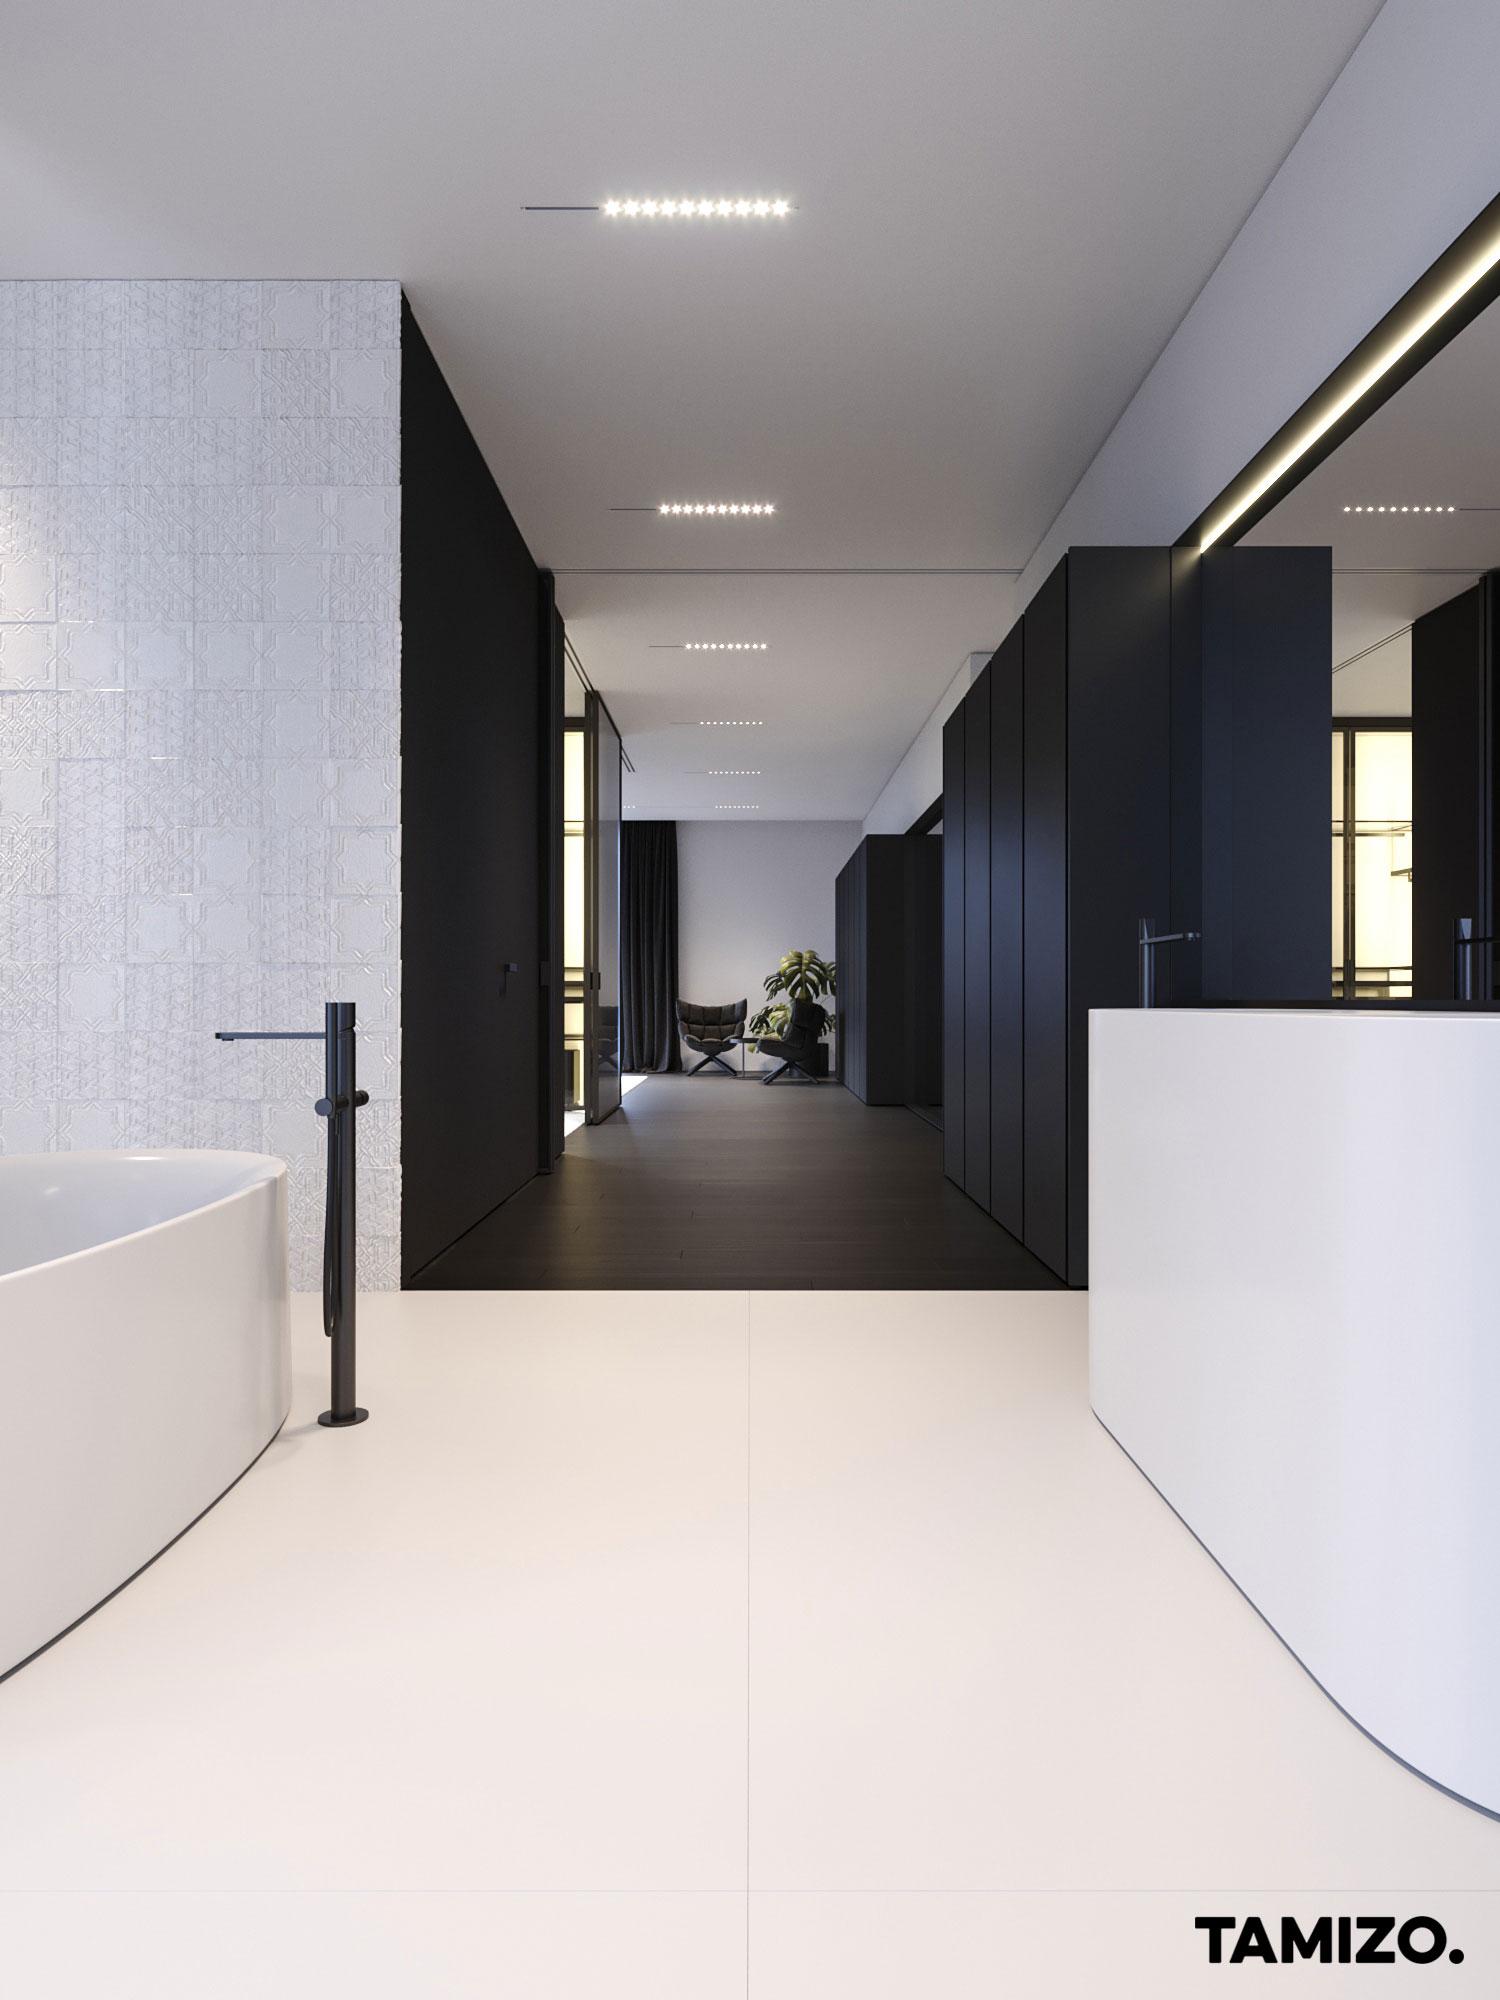 tamizo_architects_mateusz_kuo_stolarski_tomaszow_mazowiecki_interior_design_house_minimal_18